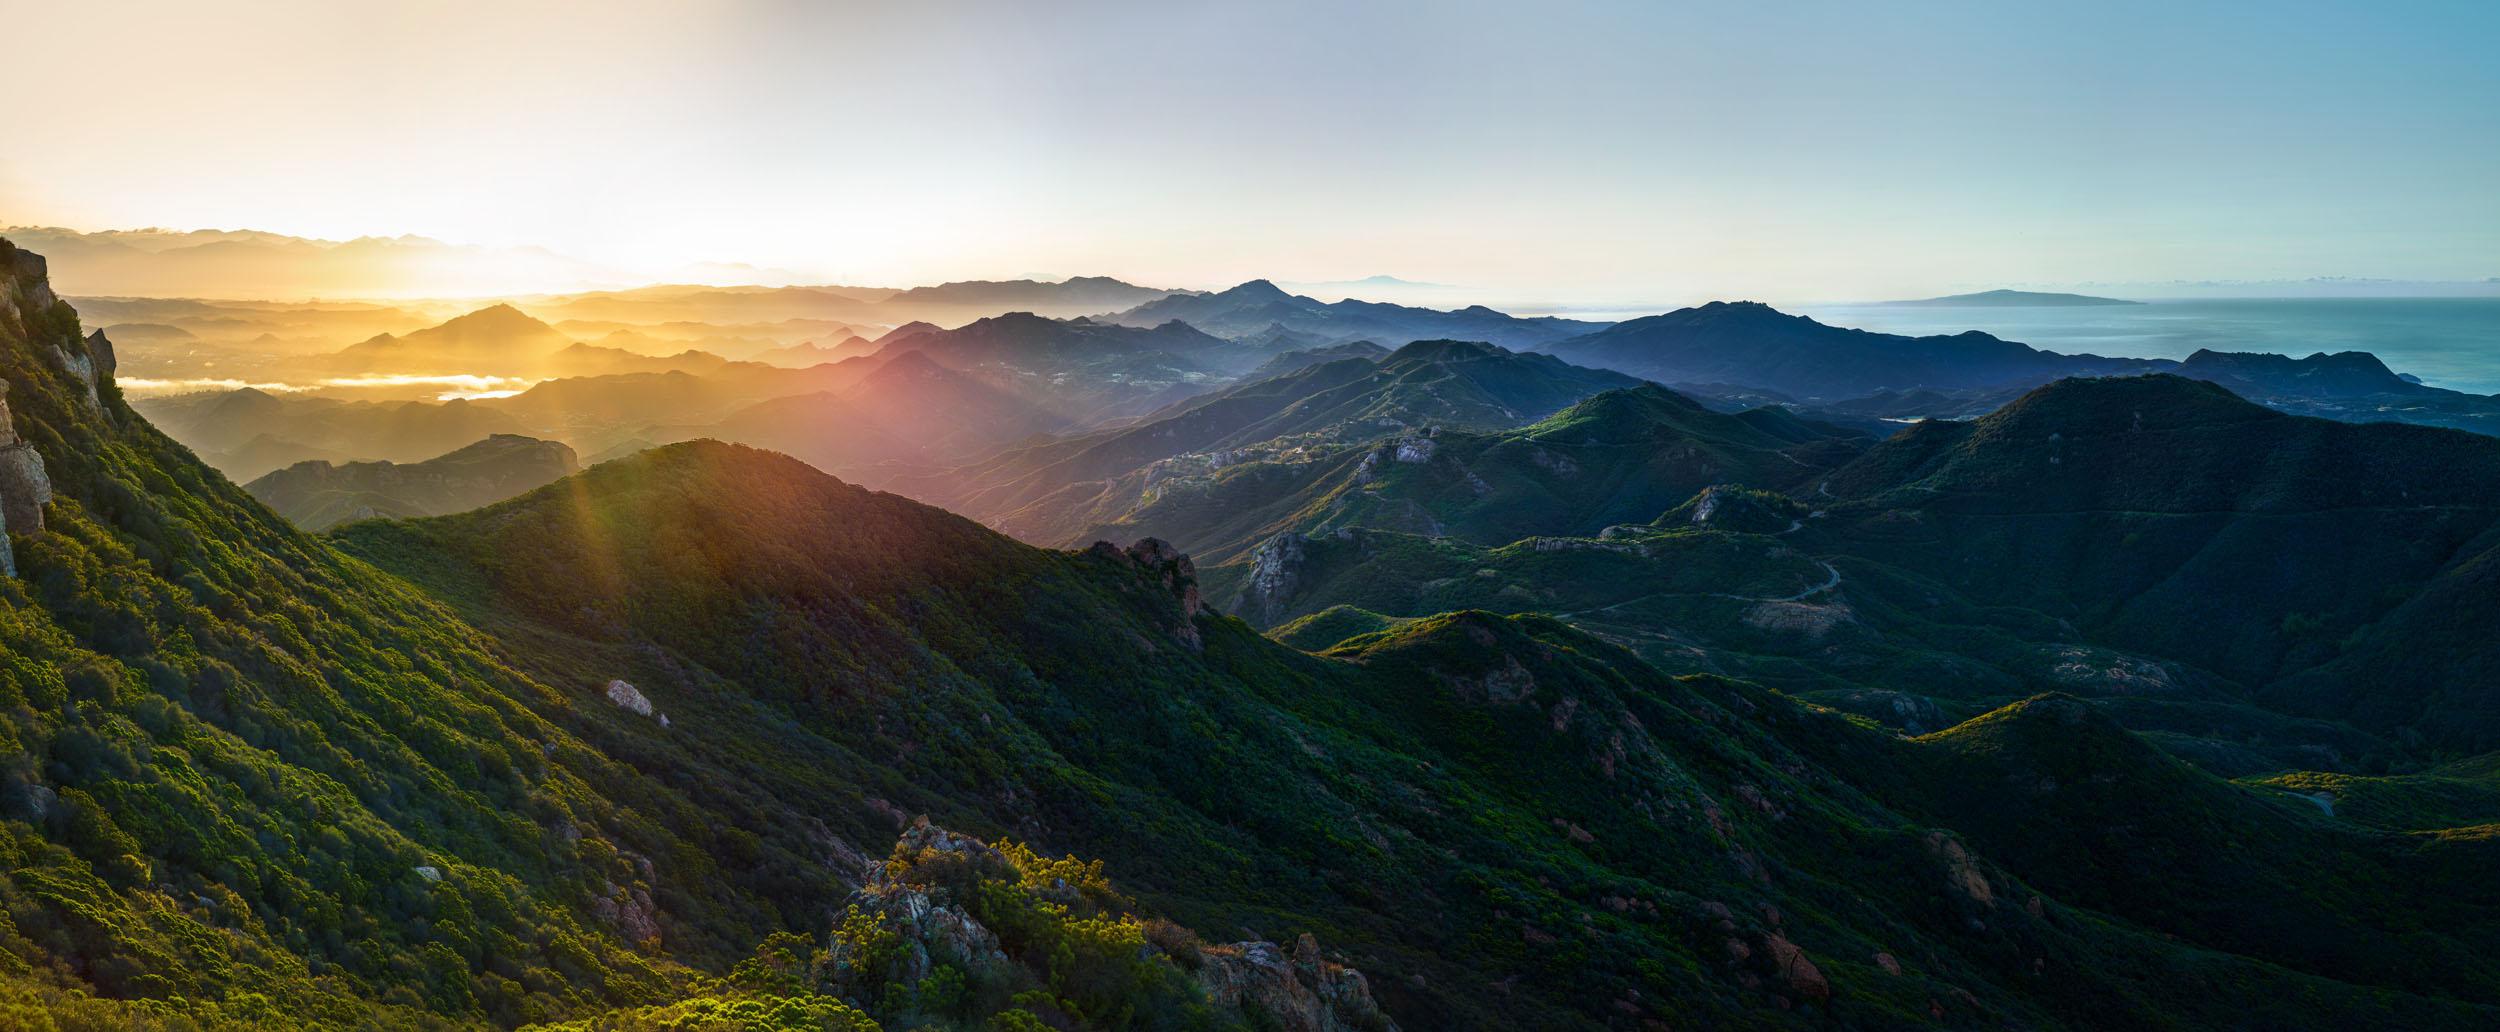 Santa Monica Mountains, CA